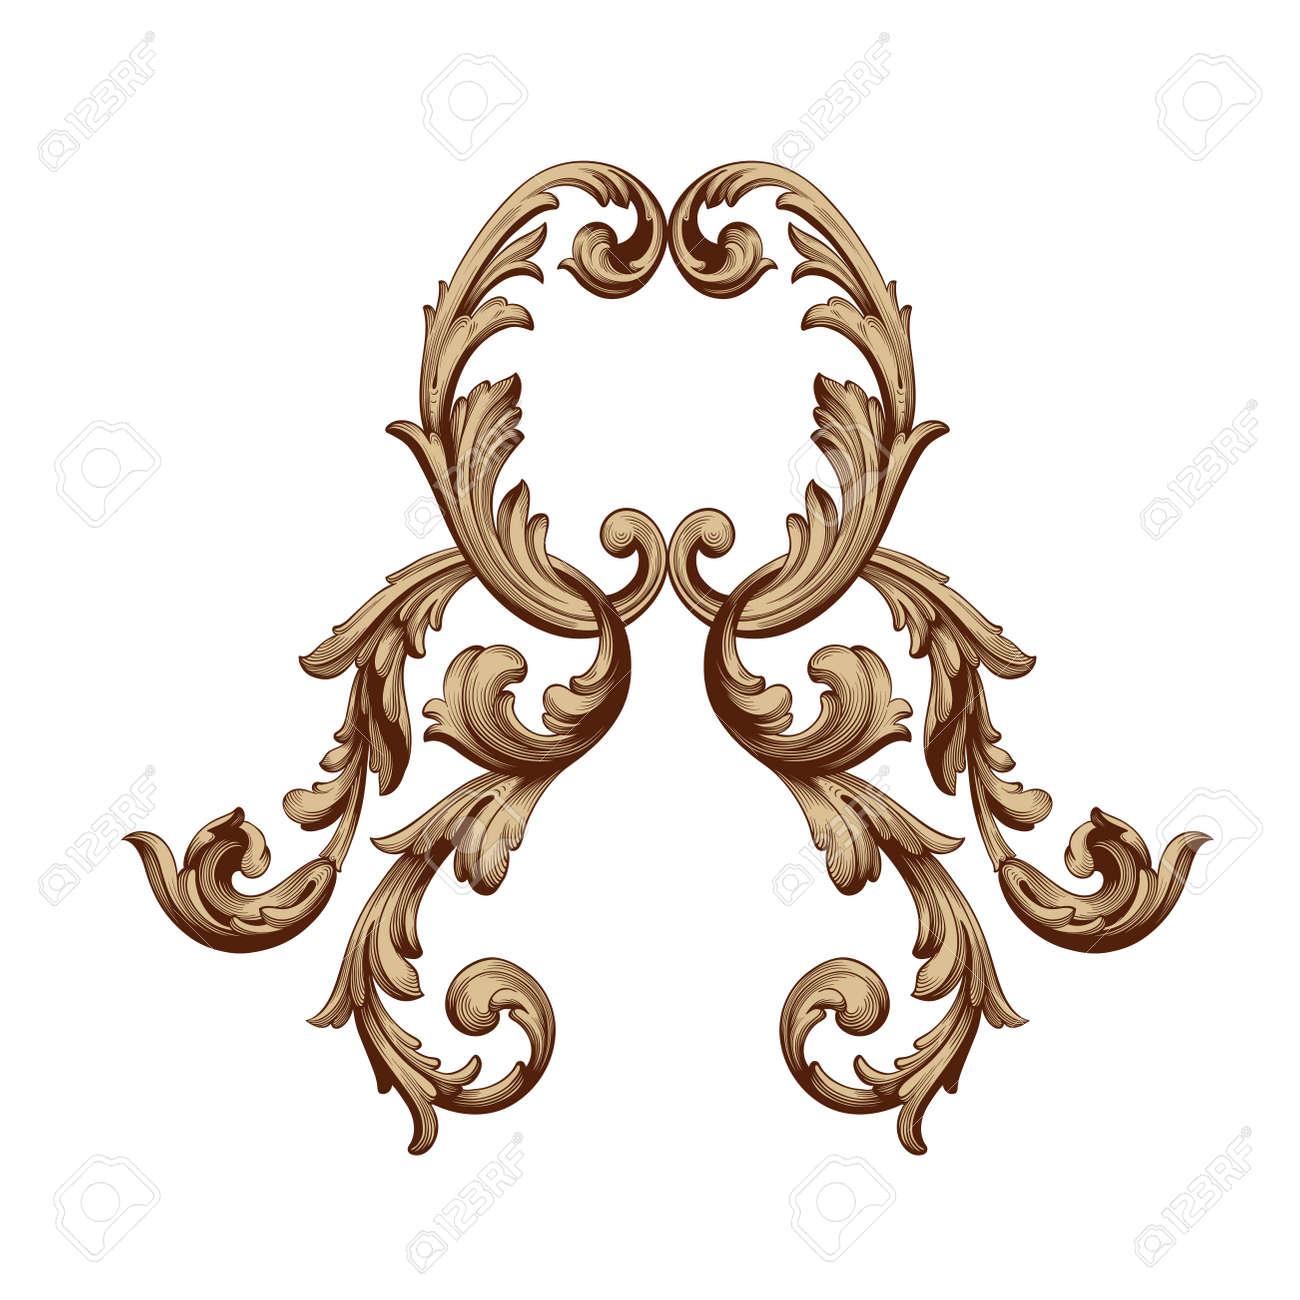 baroque vector set of vintage elements for design decorative rh 123rf com filigree vector line filigree vector line